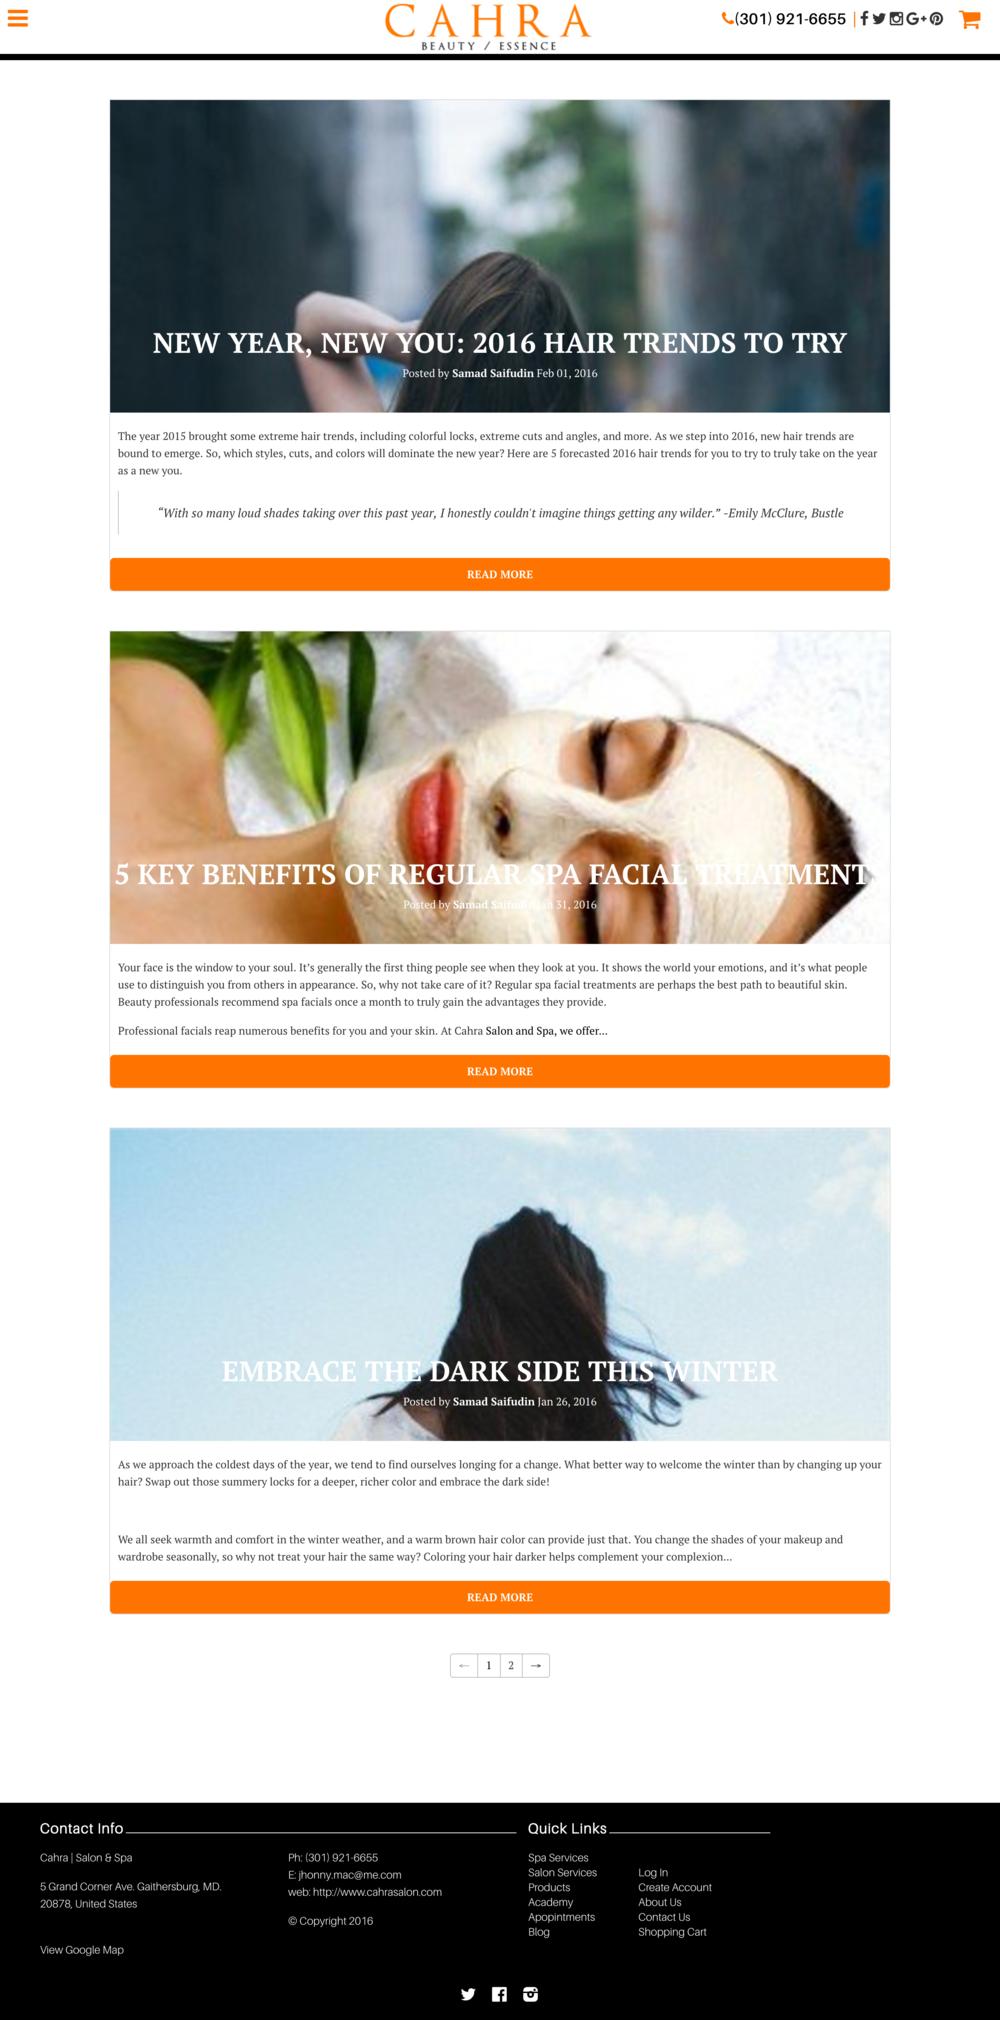 Cahra, a beauty salon, I previously blogged for.